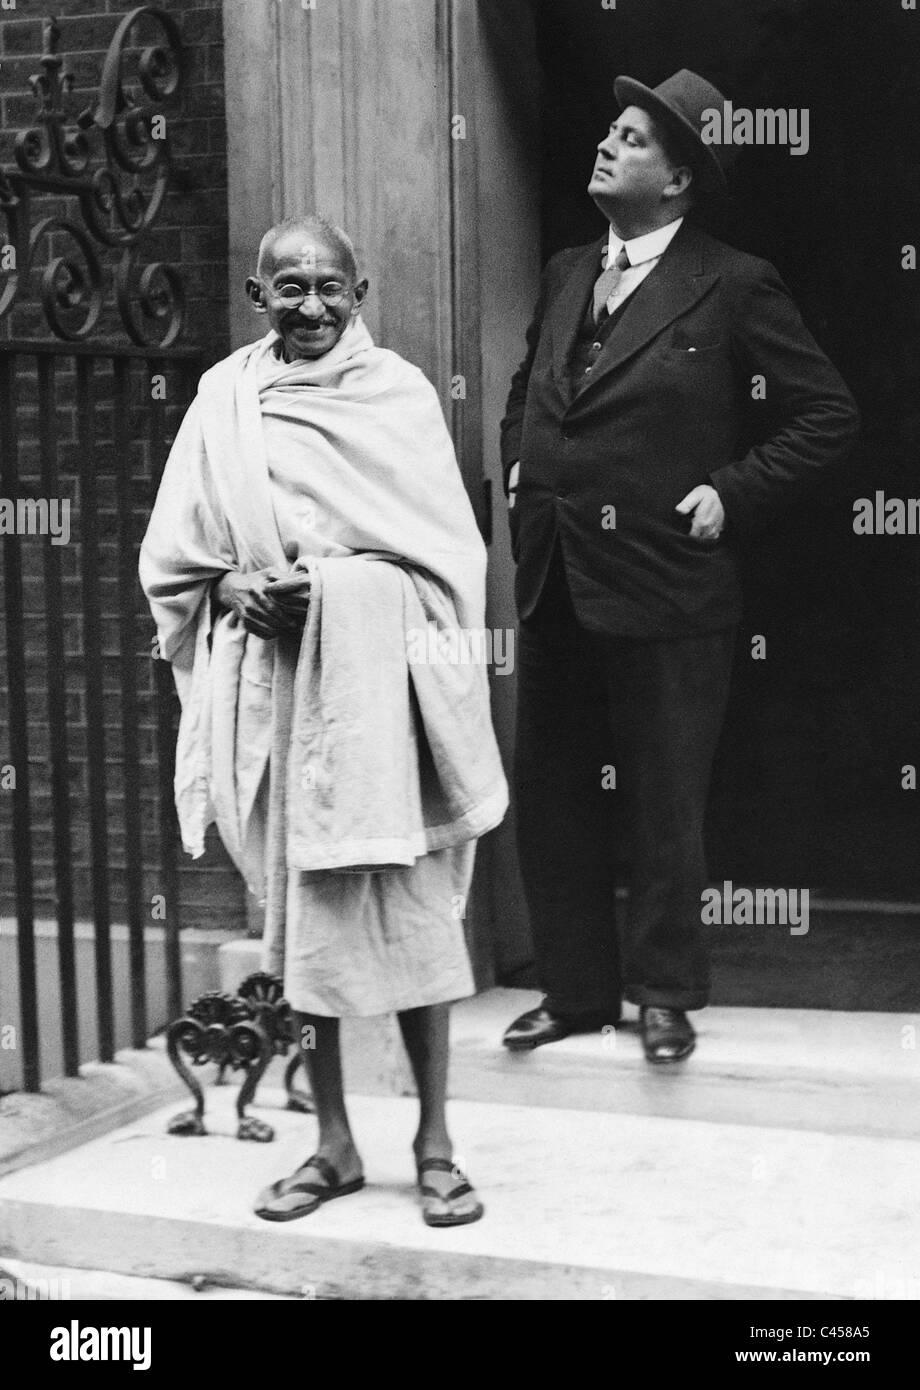 Mahatma Gandhi in front of 10 Downing Street, 1931 Stock Photo